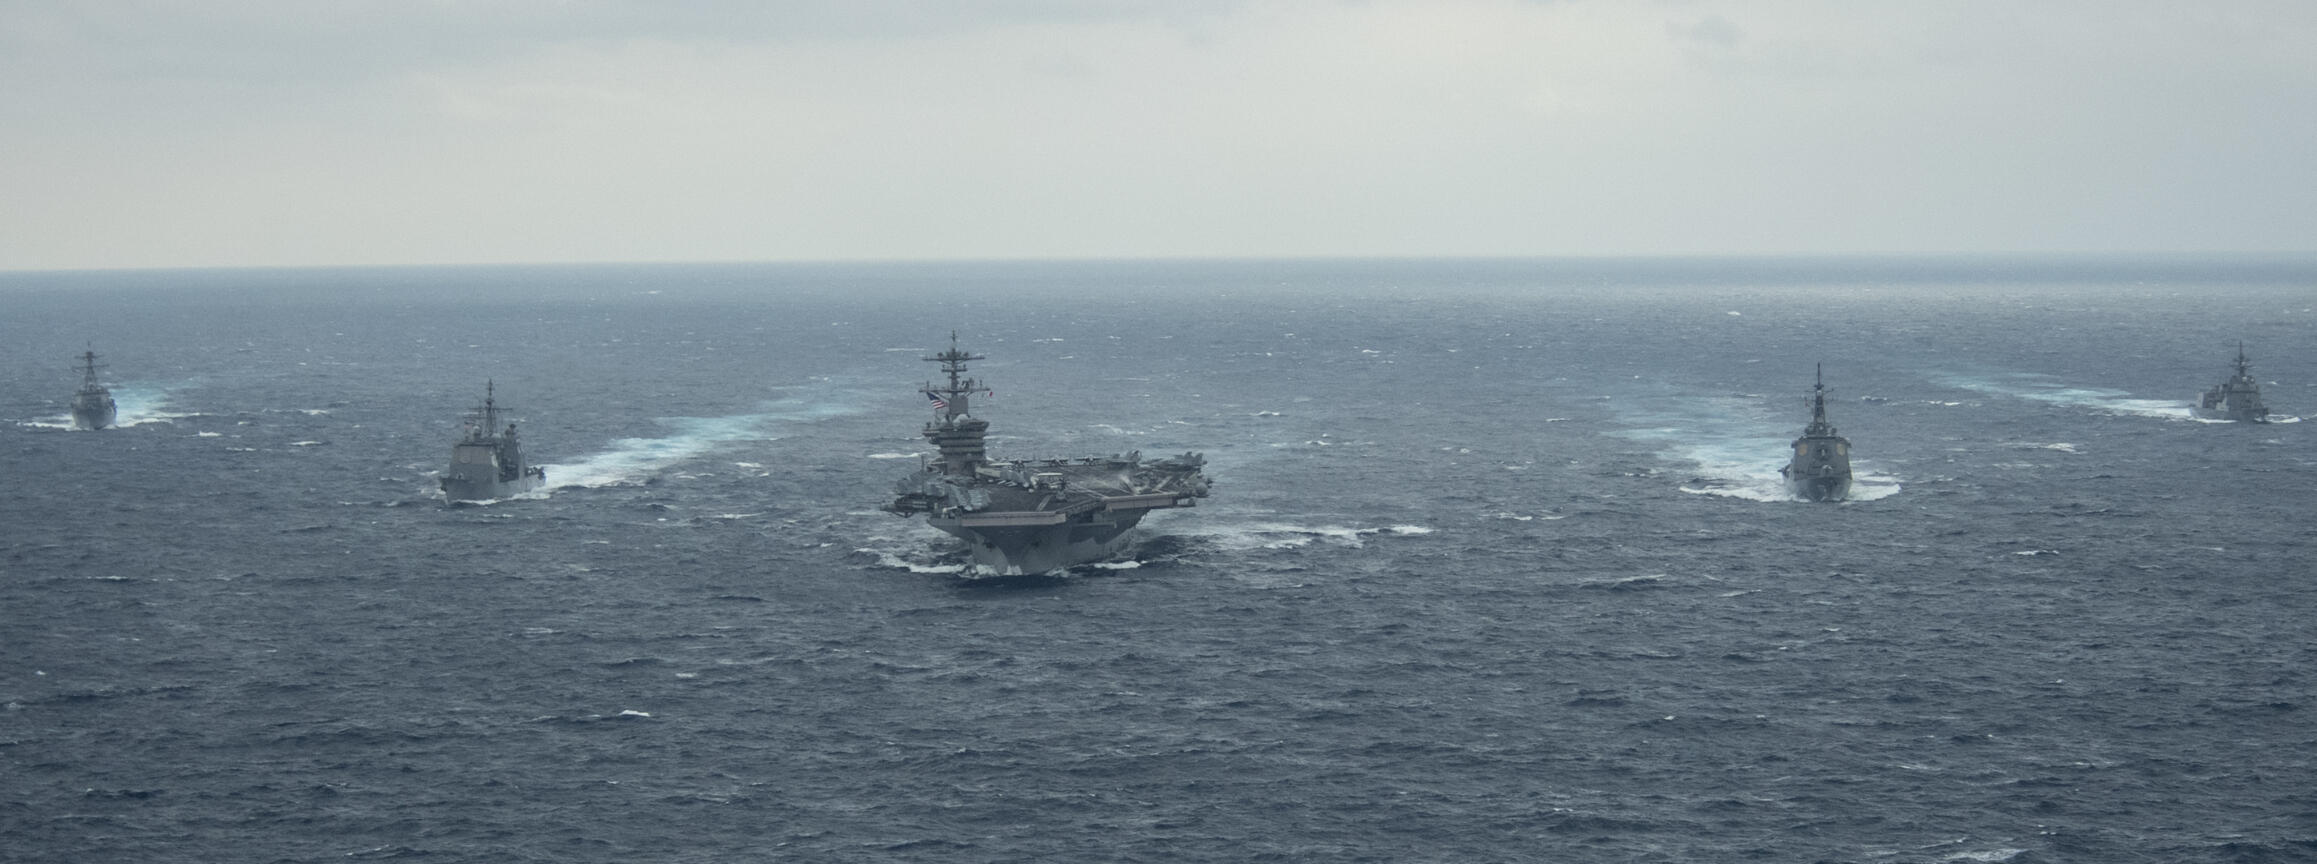 Etats Unis - Porte avions USS THEODORE ROOSEVELT